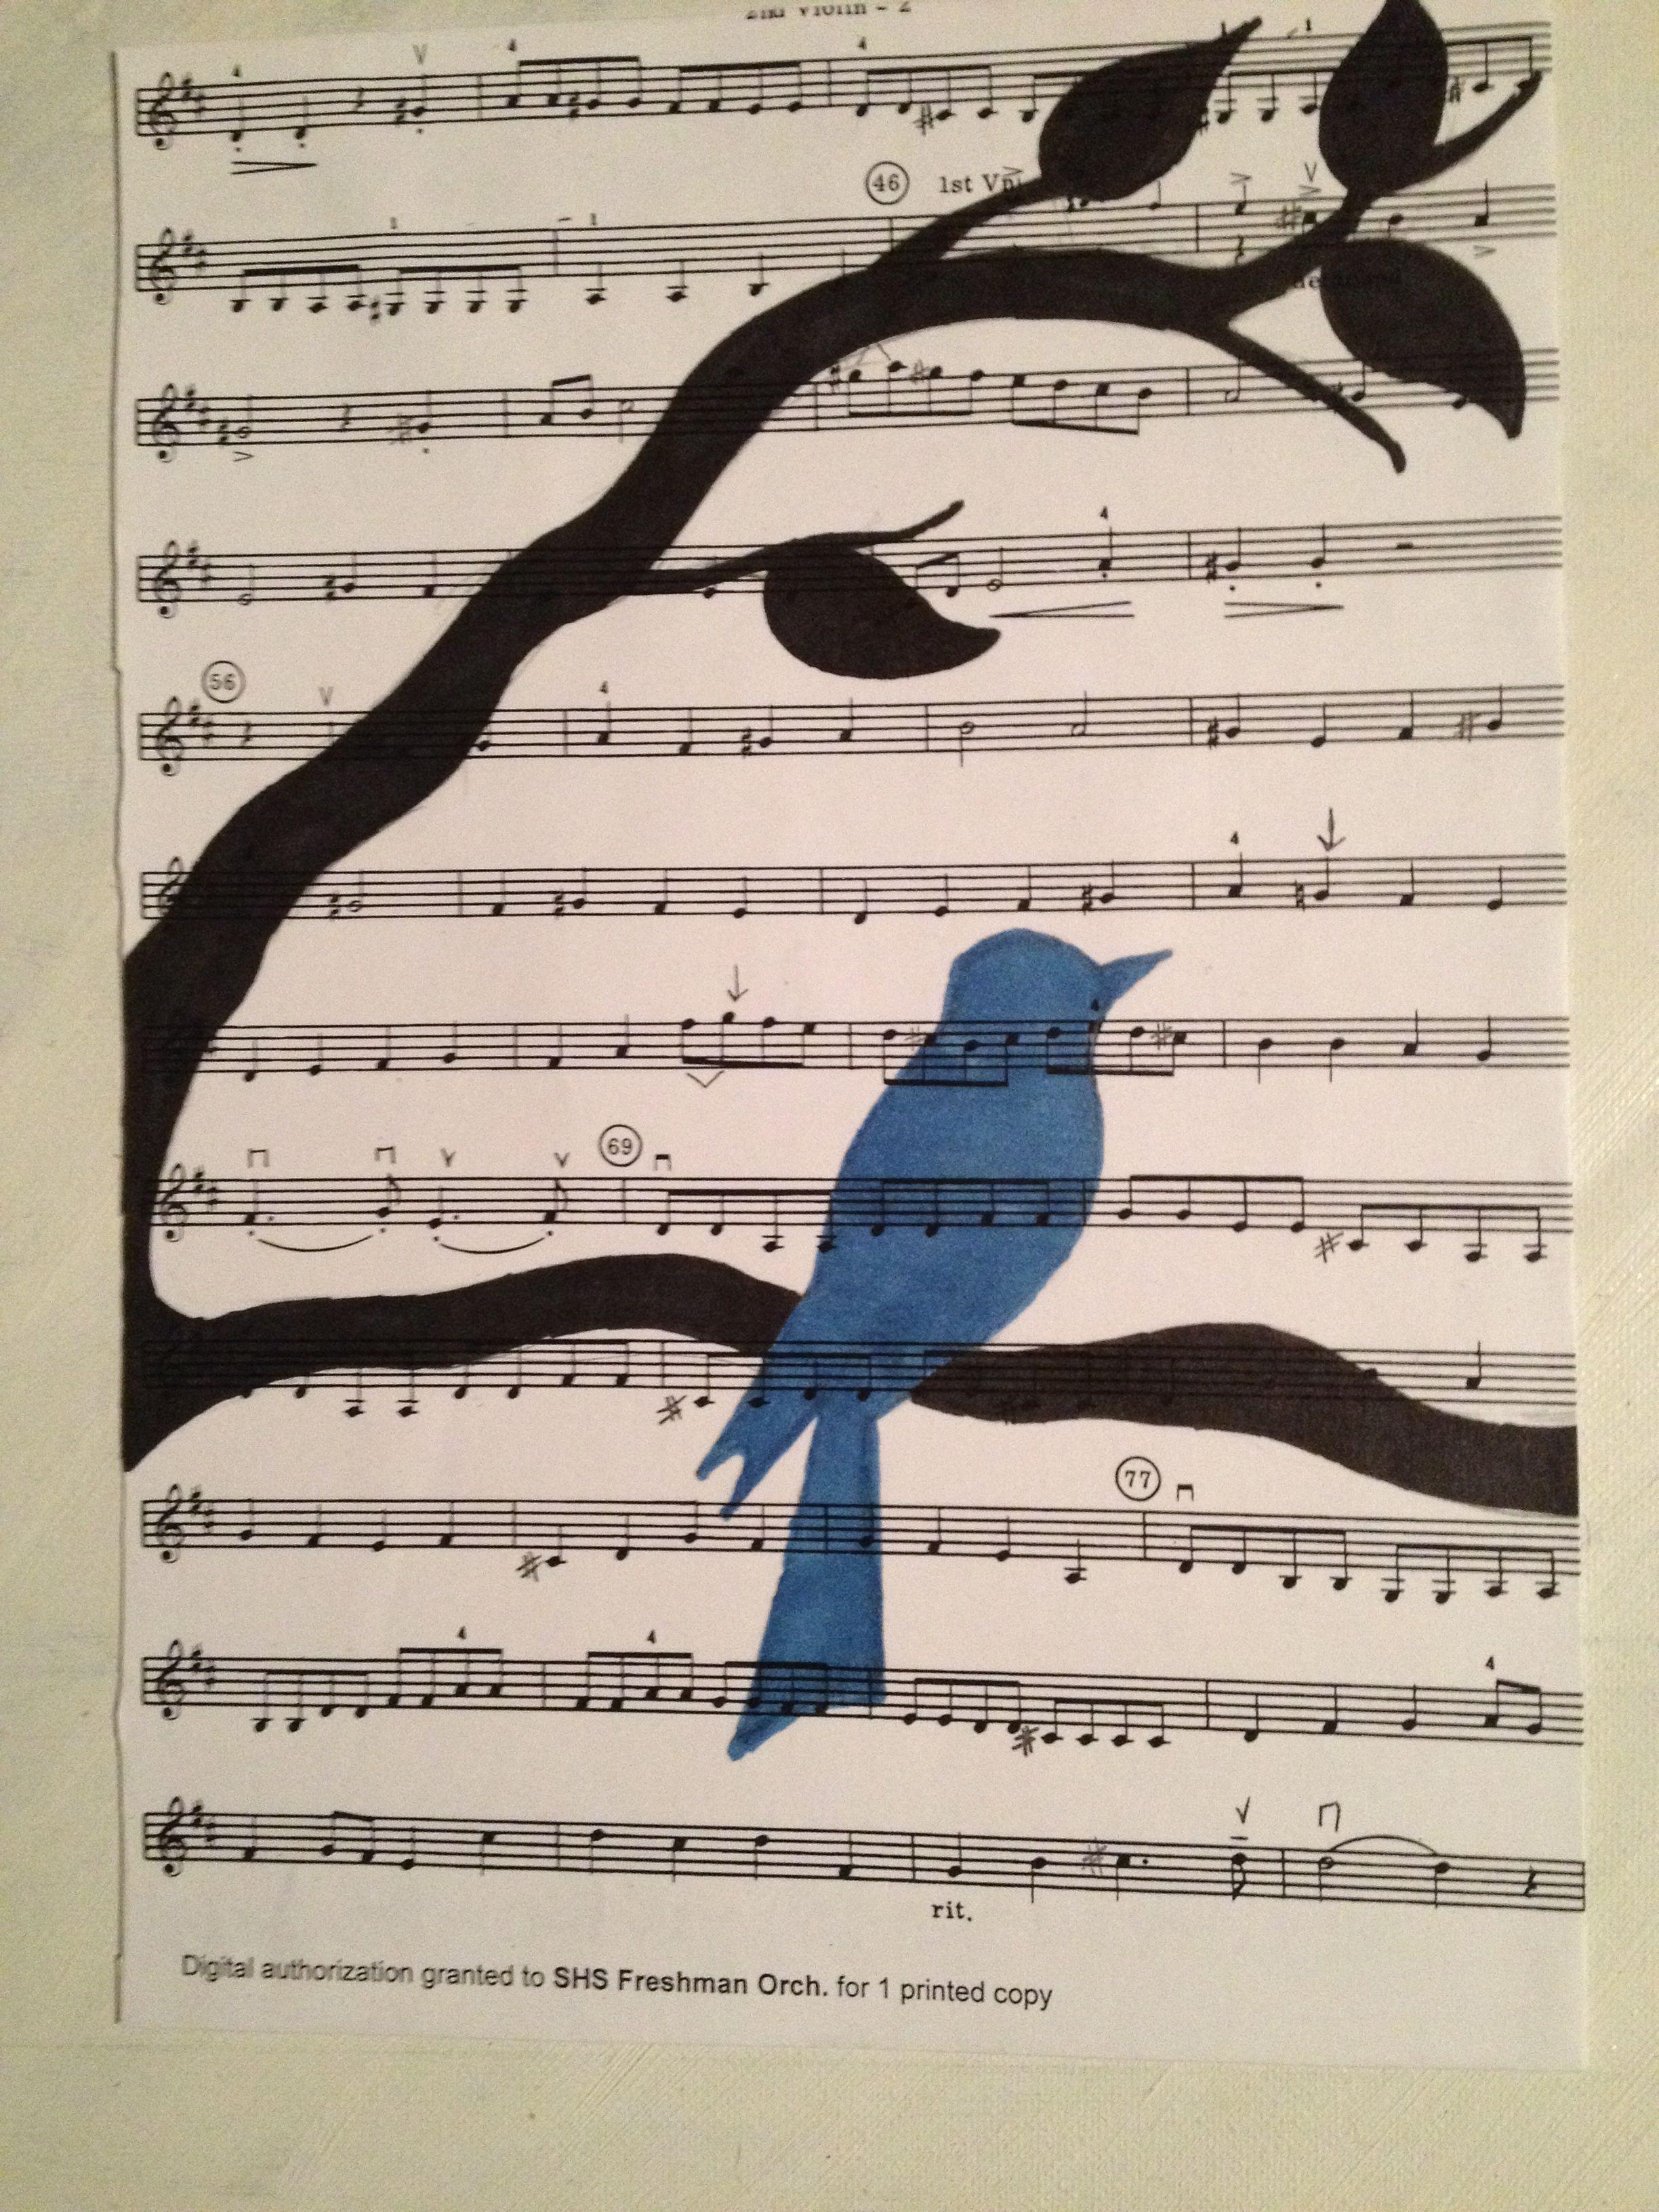 A sheet music bird. Credit to http://3.bp.blogspot.com/_ElgC8_vQlz0/TFo75baJFLI/AAAAAAAAItw/JwQy1hLyCJ0/s1600/DSC06035.JPG For the idea. IreneTheWorld